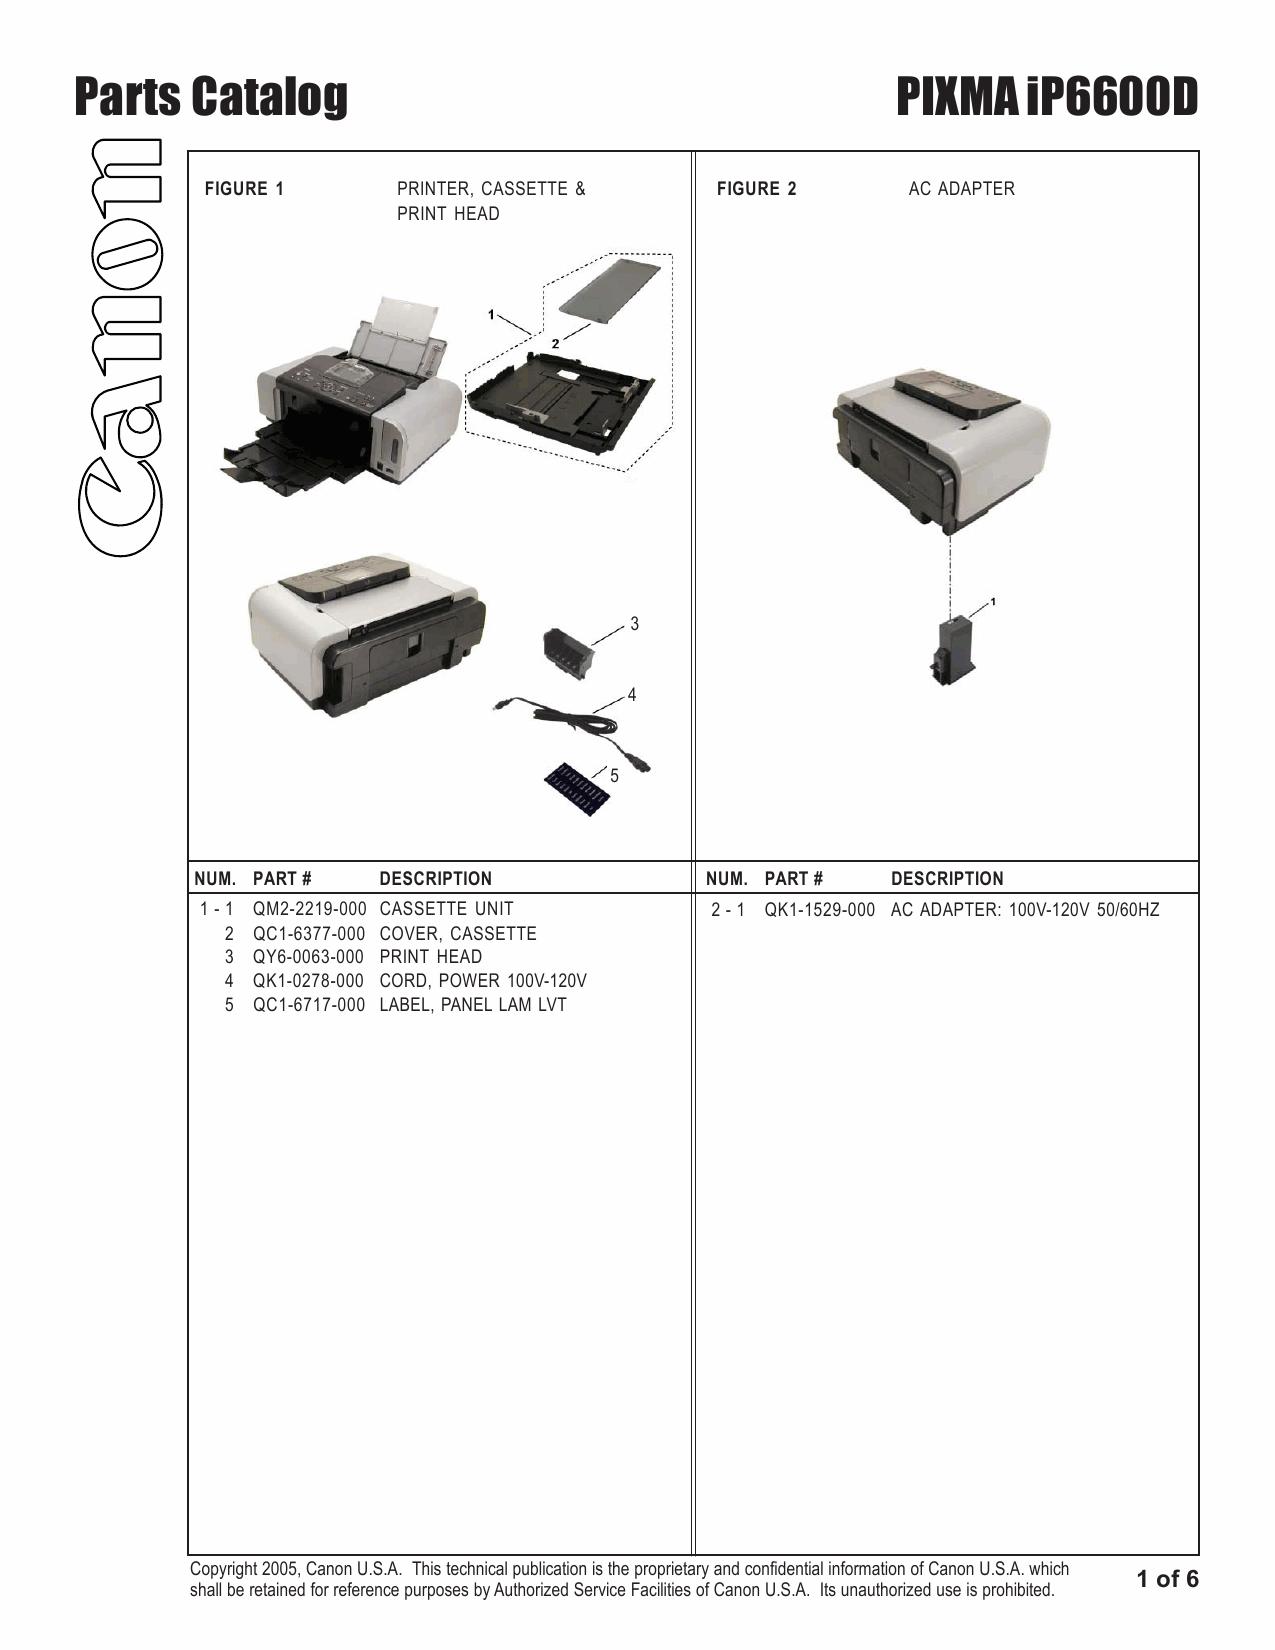 Электрическая схема canon ip4000